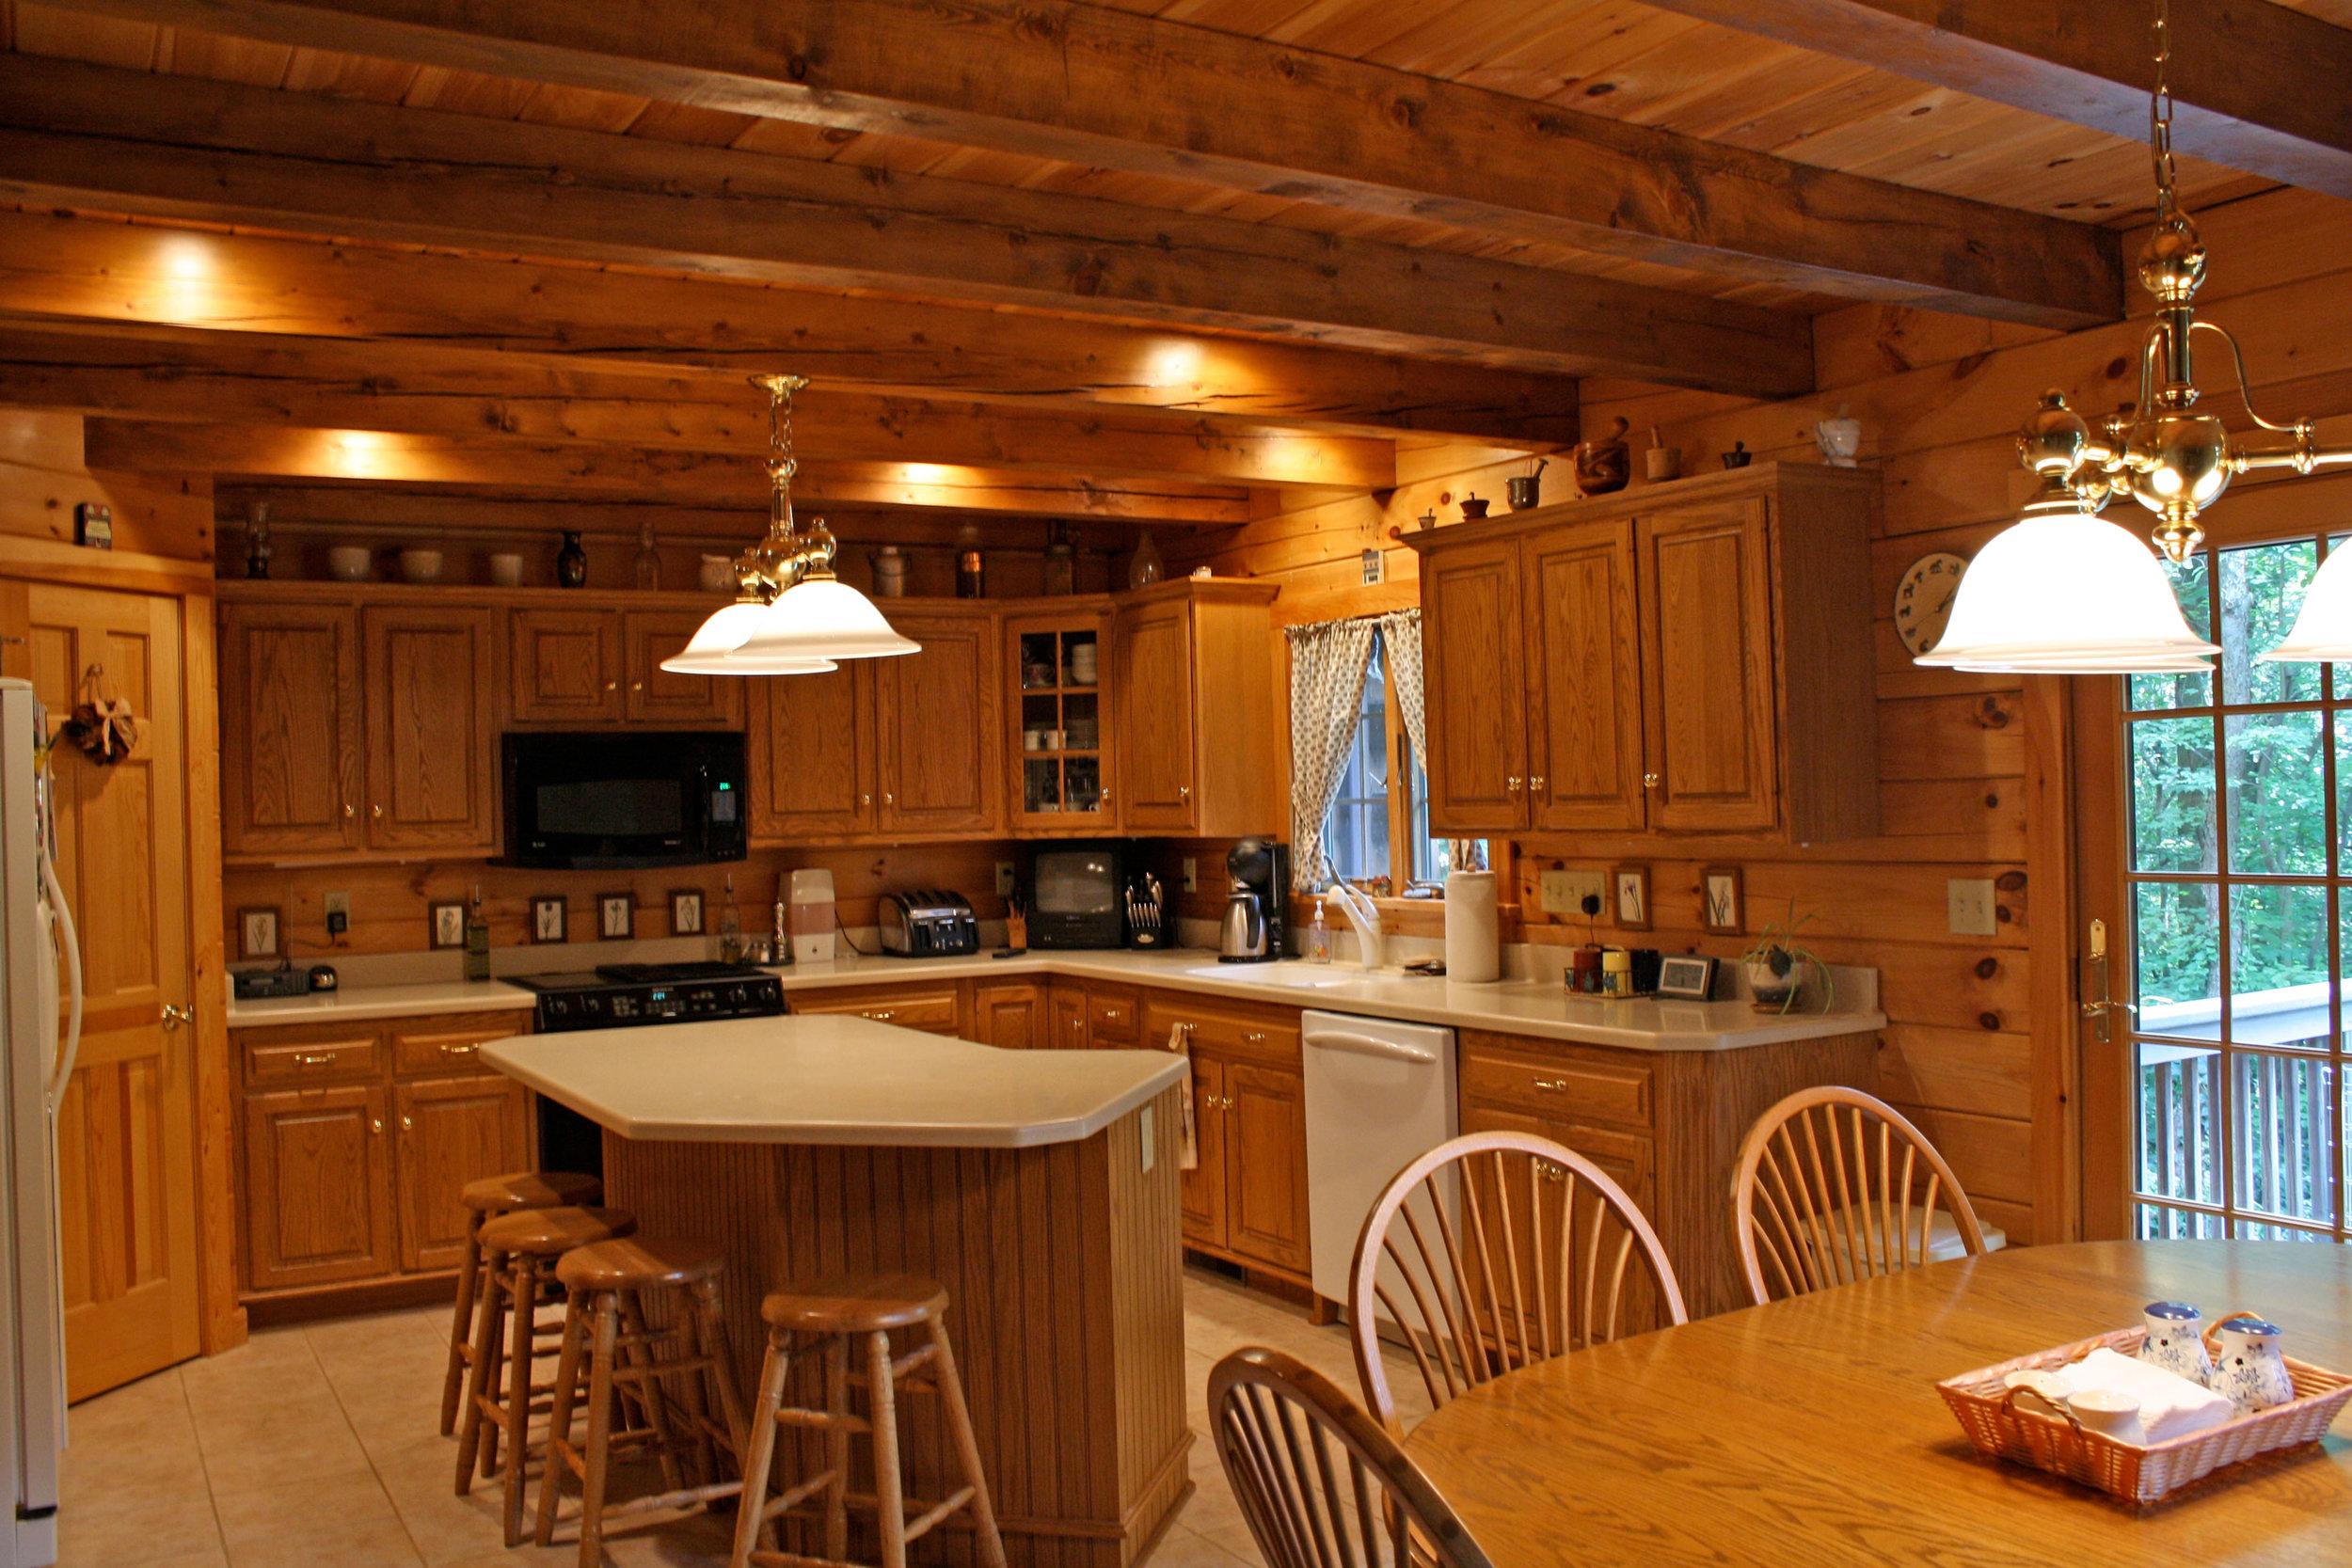 cabin-kitchen-dining-room-wide-view.jpg